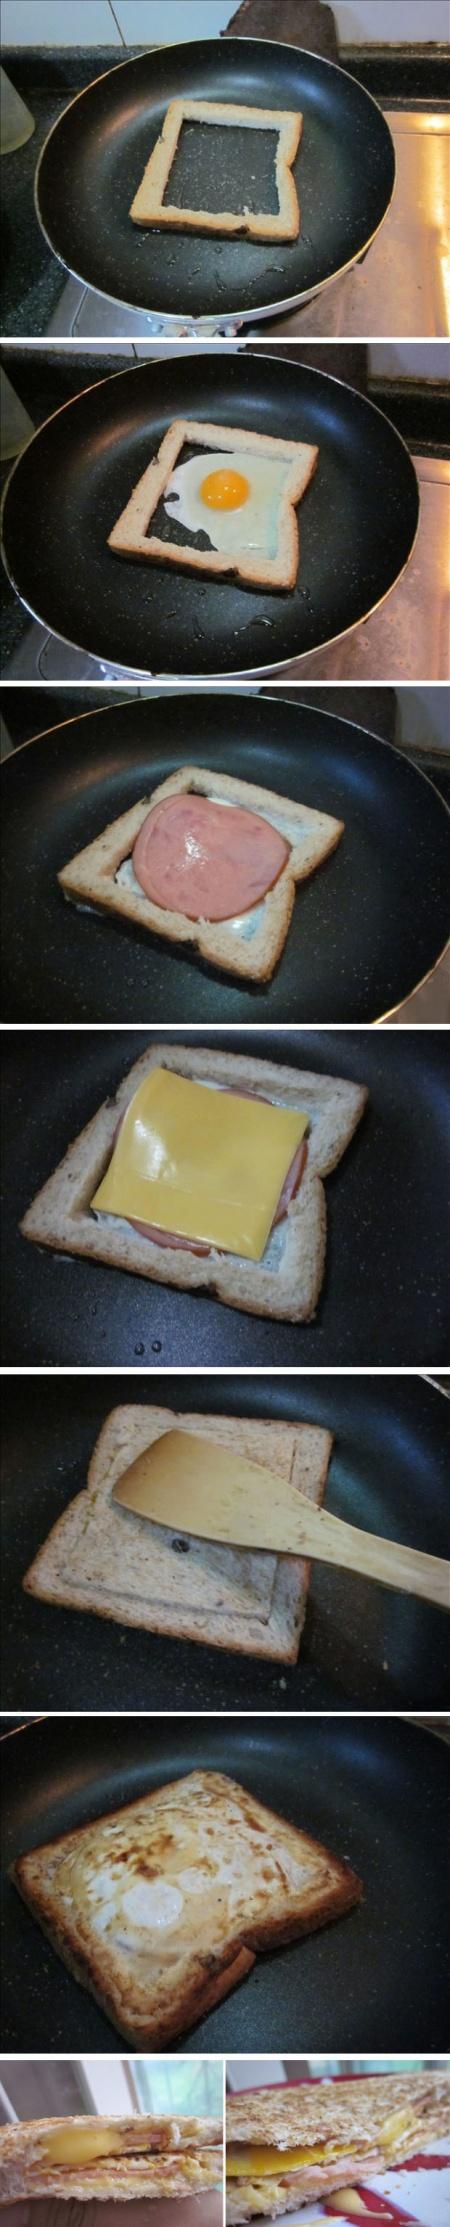 09-tosta-mista-fechada